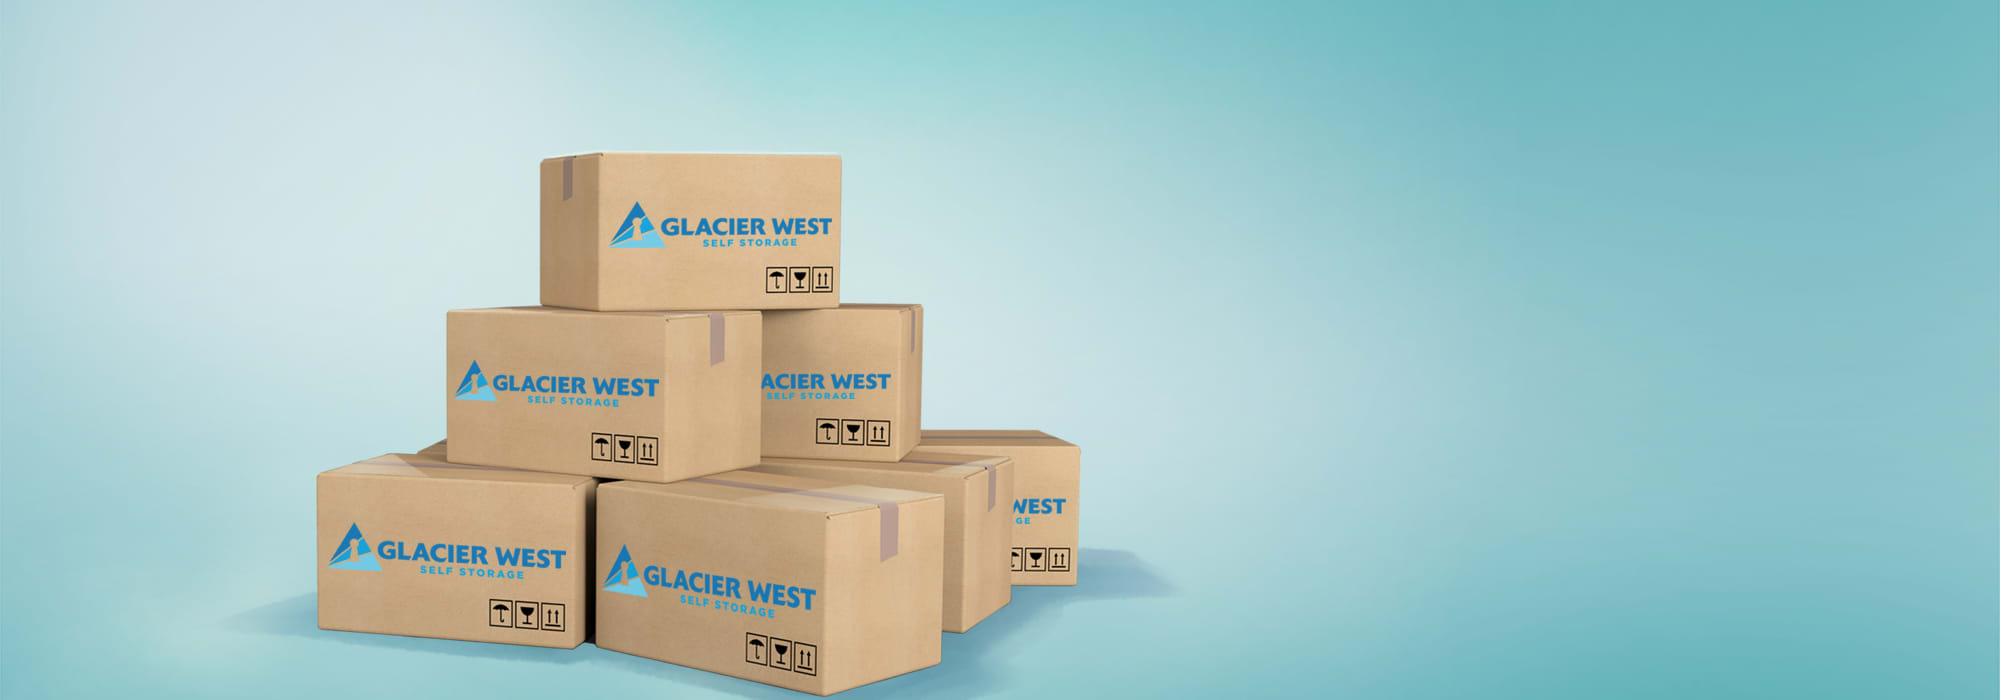 Glacier West Self-Storage self storage in Belfair, Washington